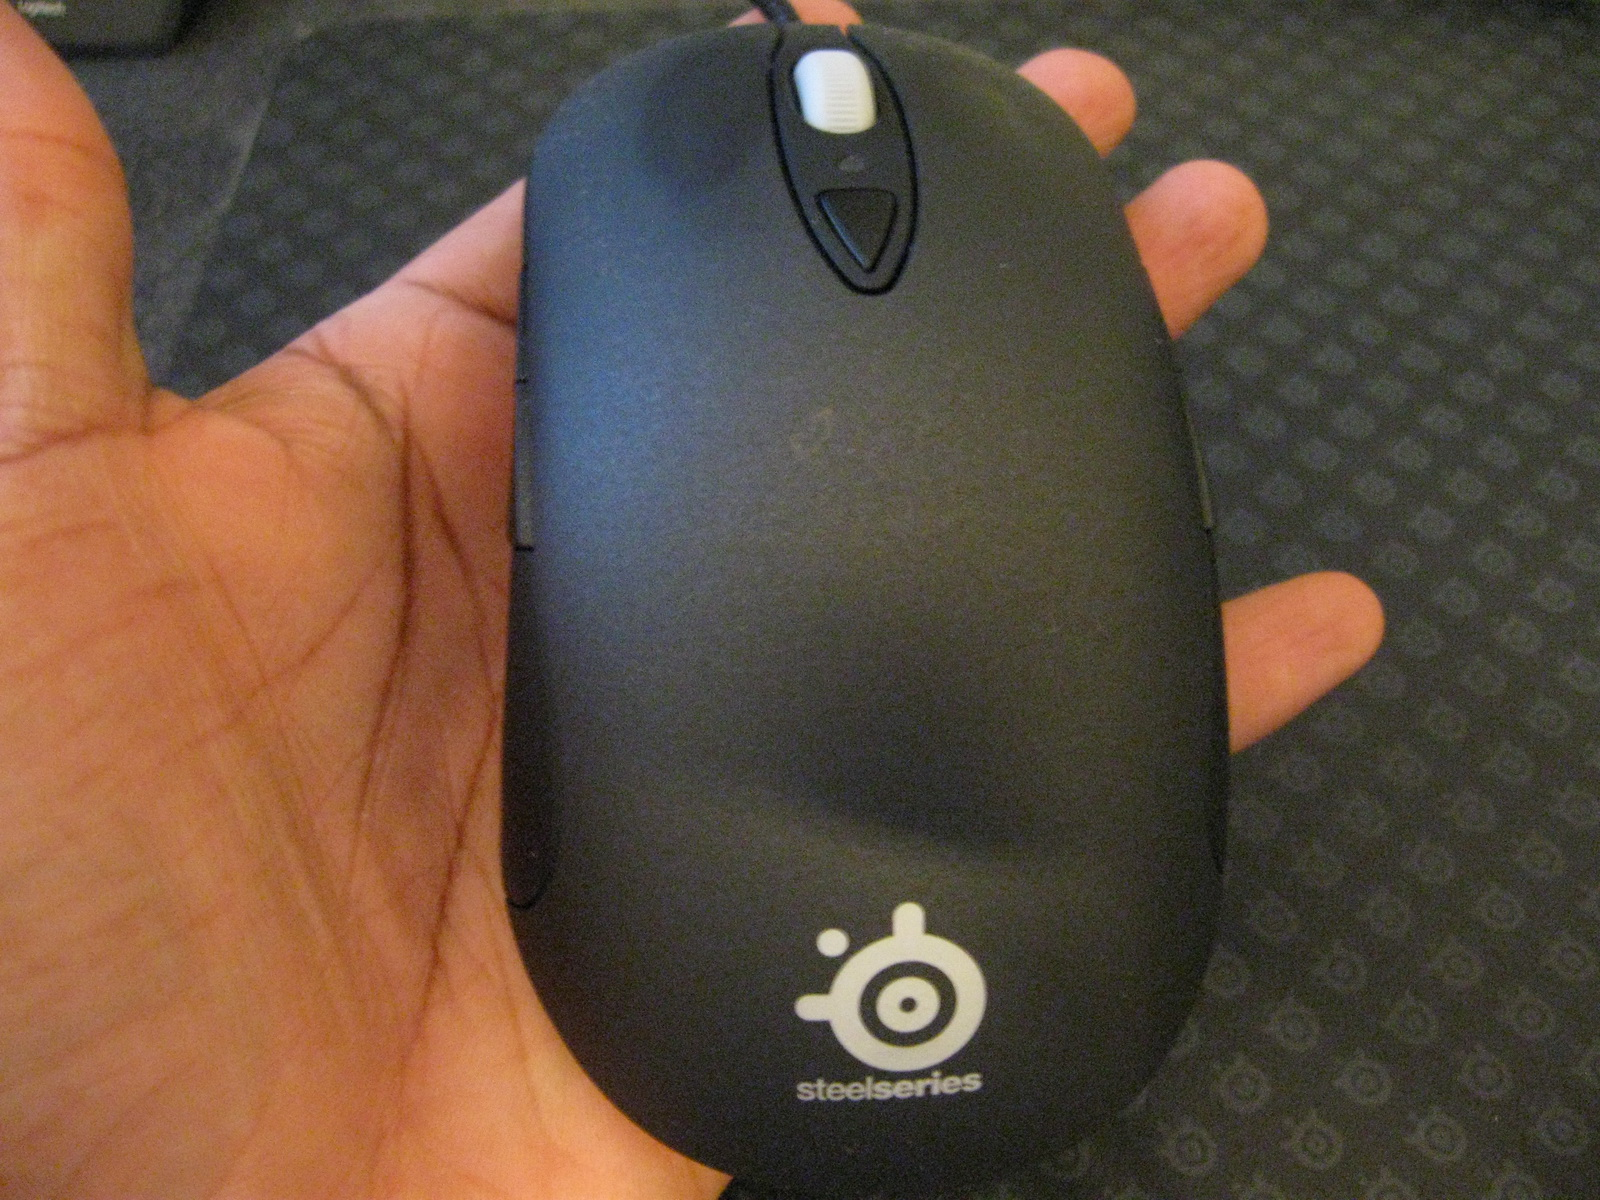 Steelseries XAI laser mouse